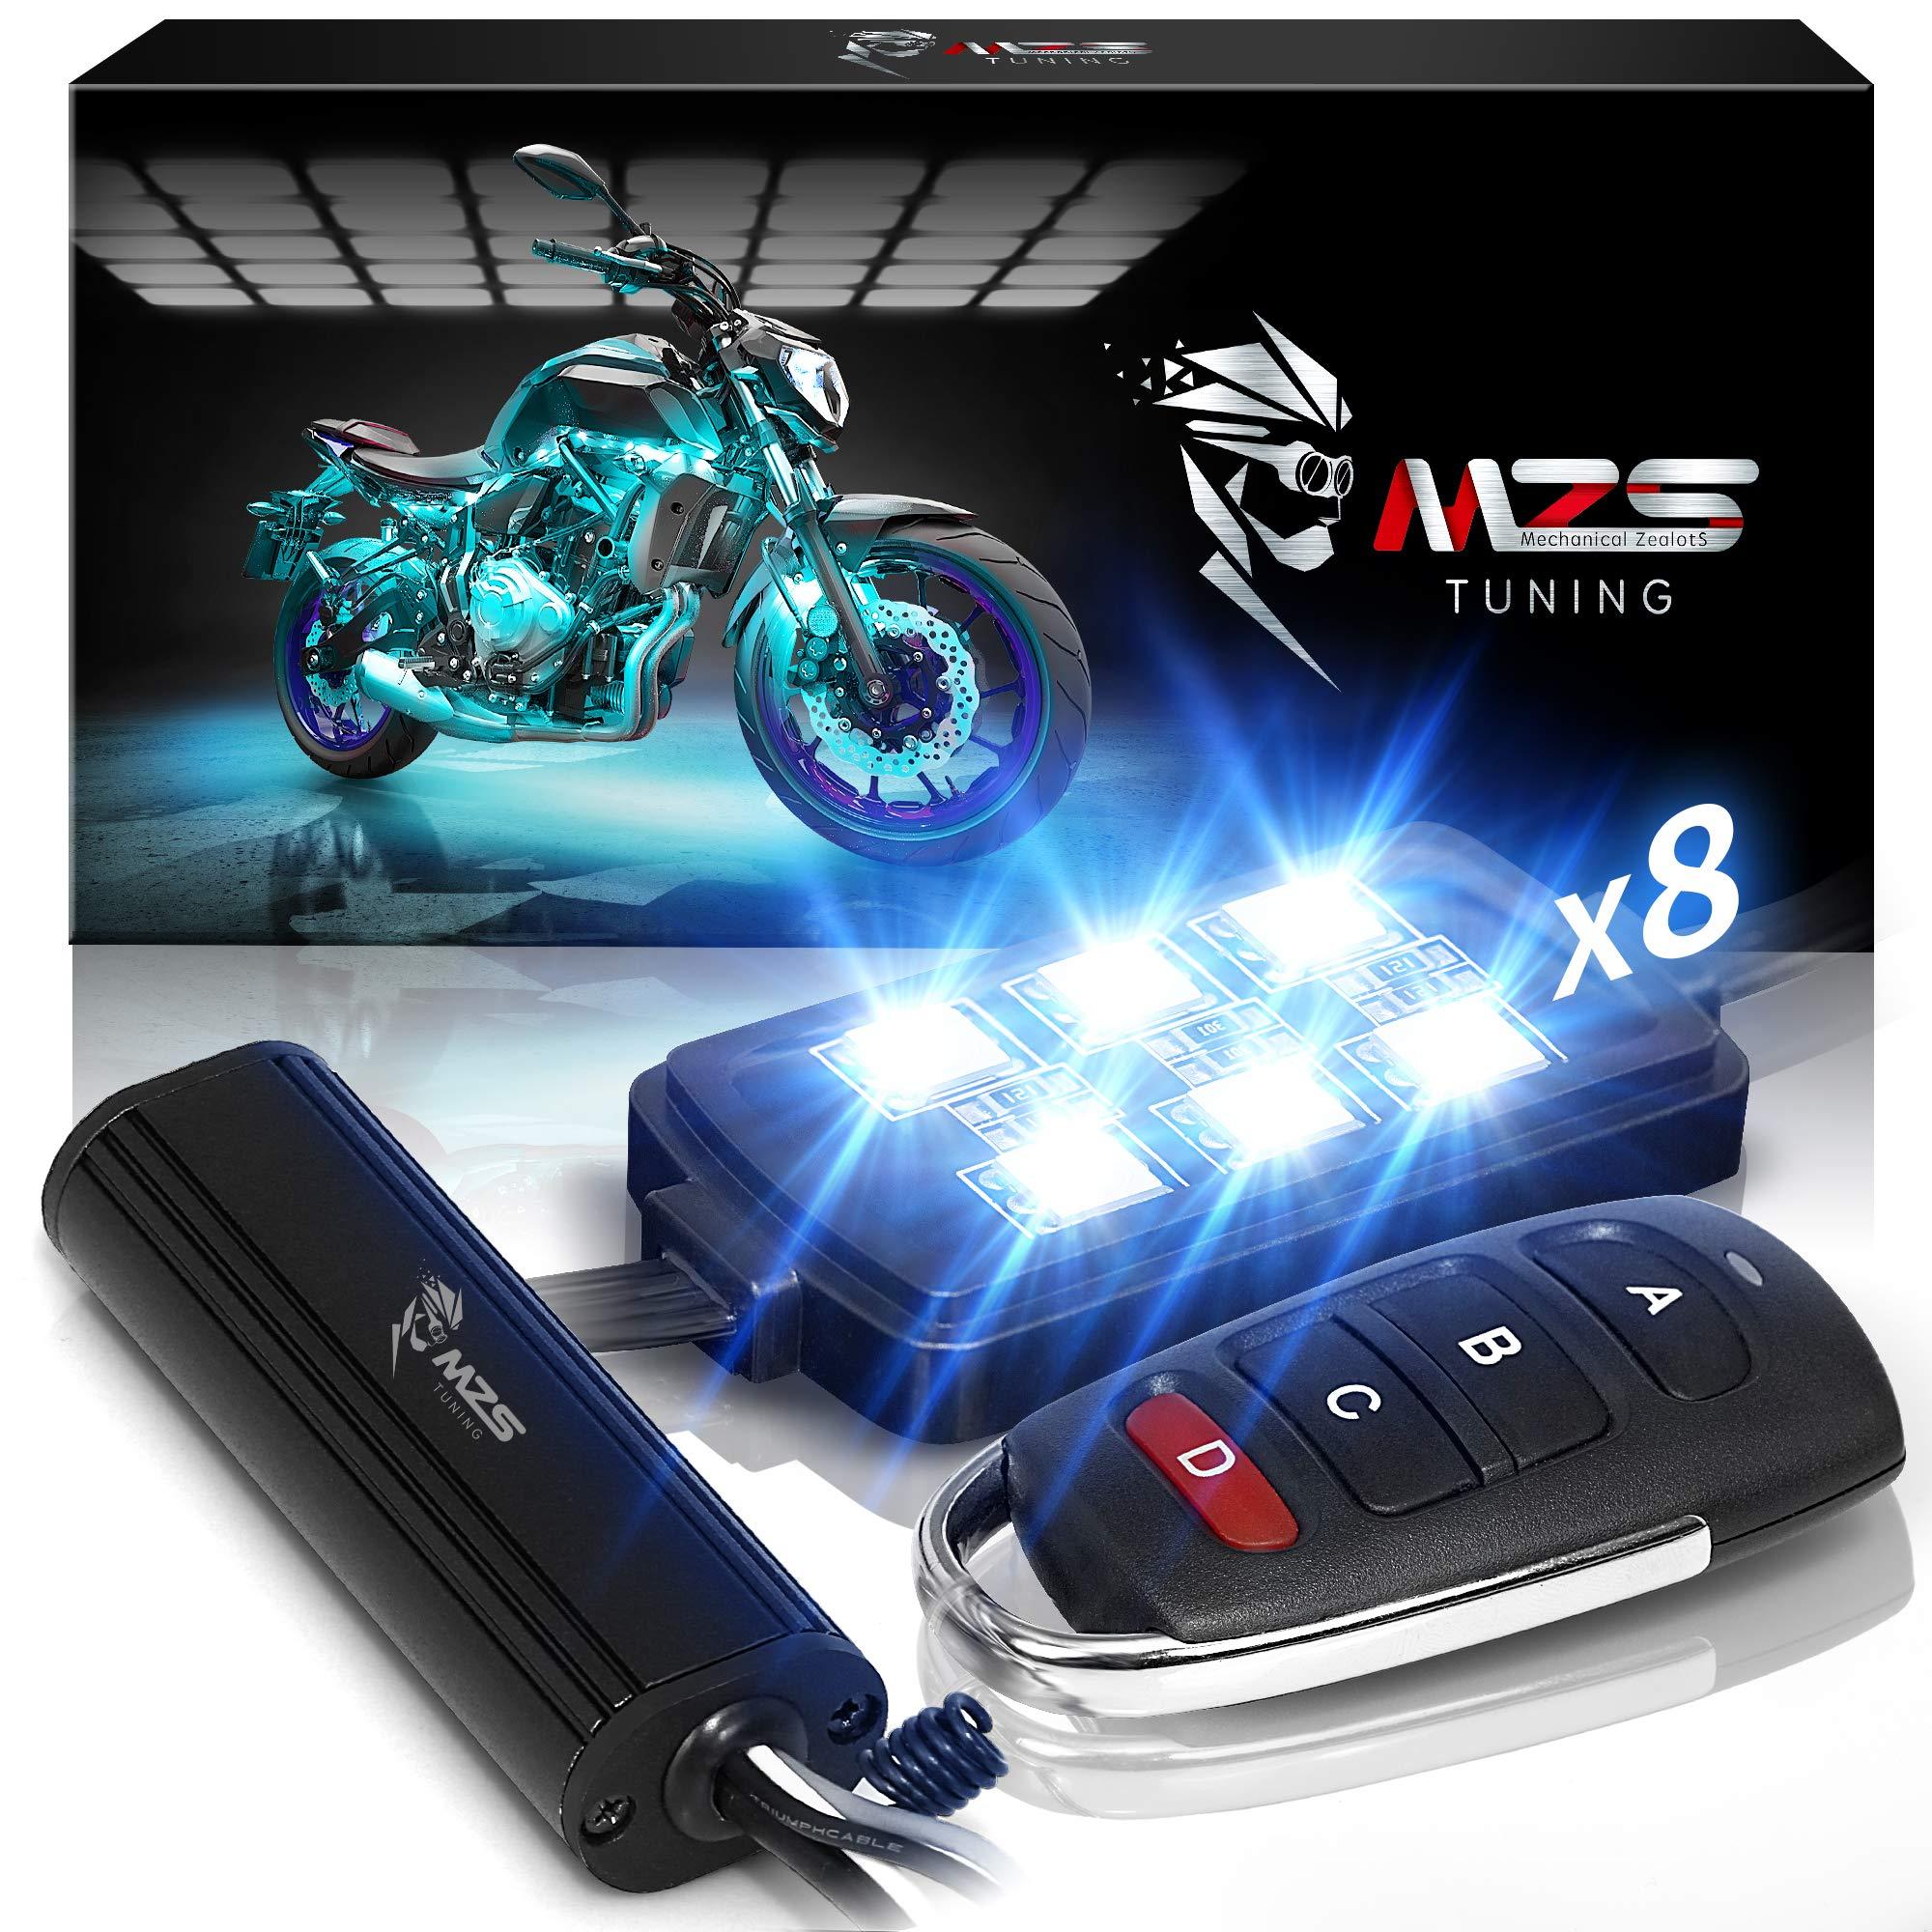 MZS LED Light Kit Multi-Color Neon RGB Strips Wireless Remote Controller for ATV UTV Cruiser Harley Davidson Ducati Suzuki Honda Triumph BMW Kawasaki Yamaha (Pack of 8) by MZS